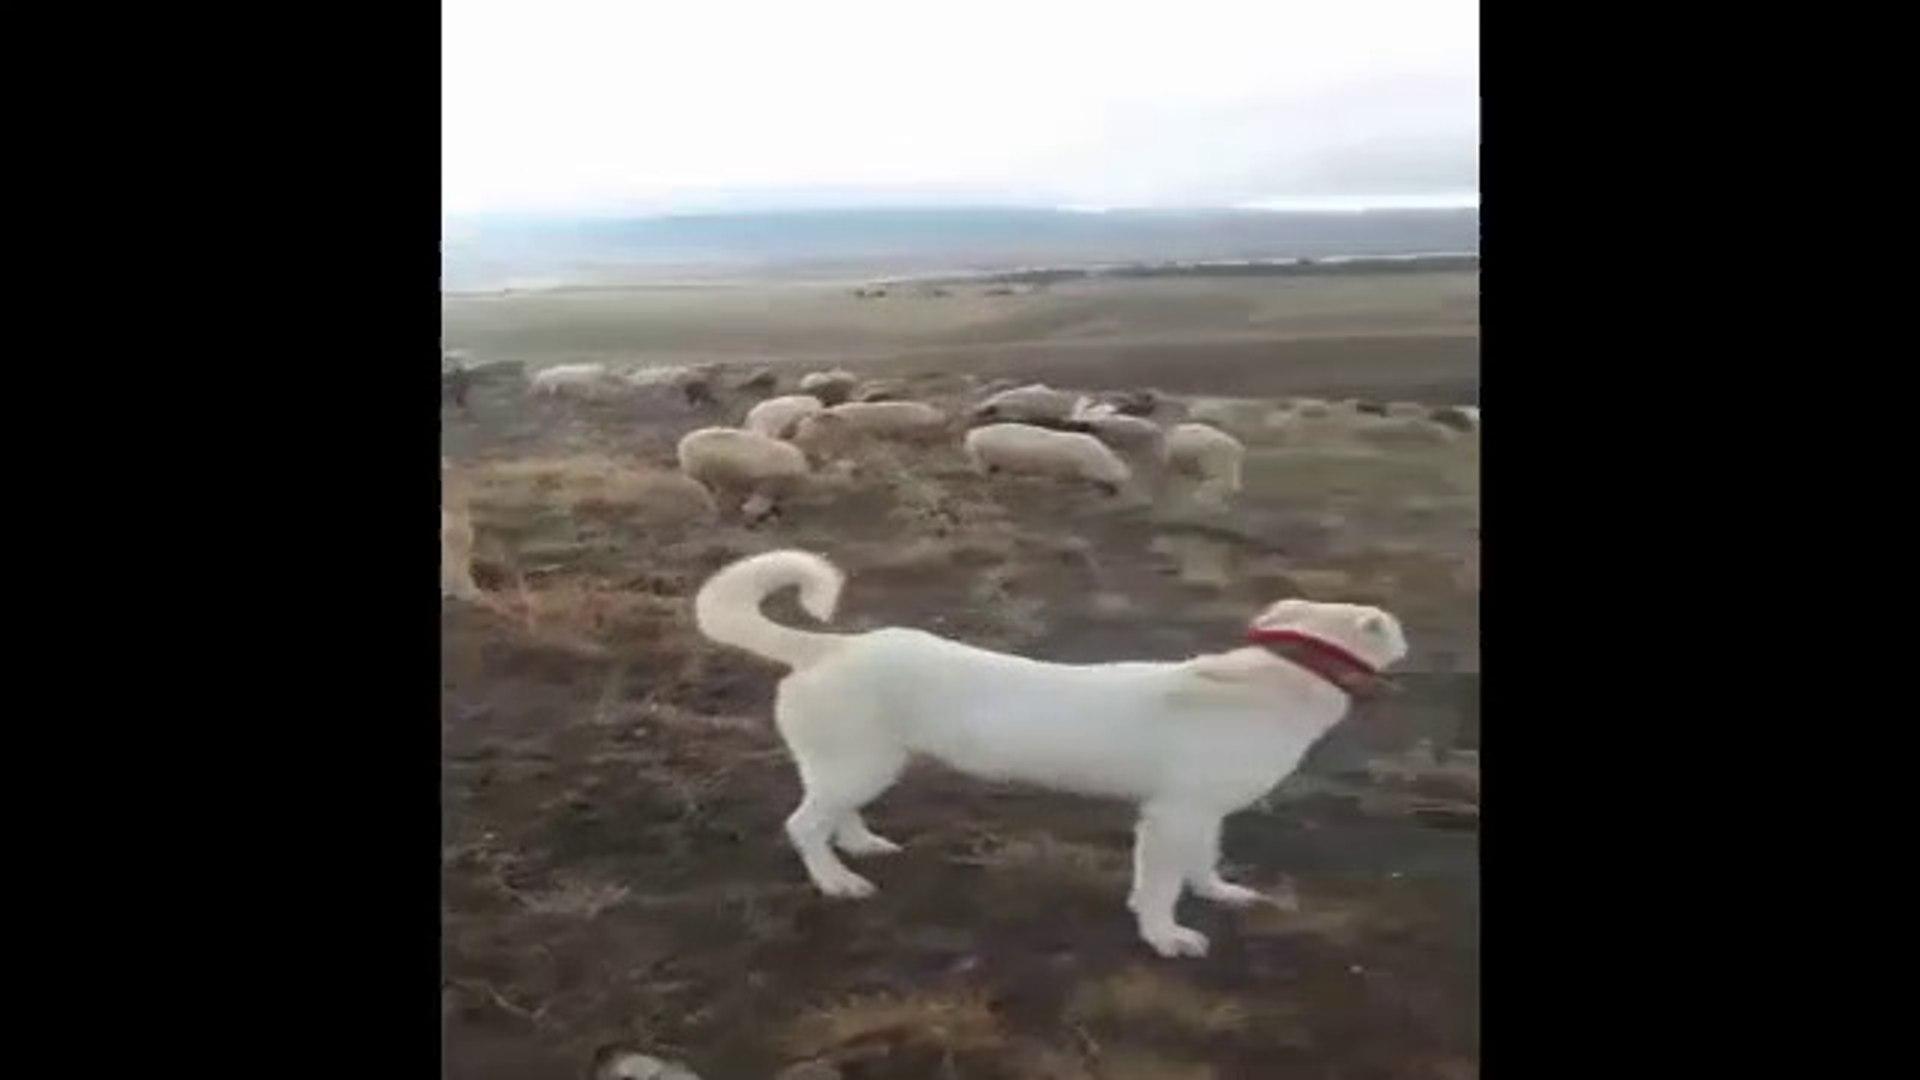 AKBAS ve ALA COBAN KOPEKLERi KOYUN NOBETi - AKBASH and ALA SHEPHERD DOG SHEEP WATCH